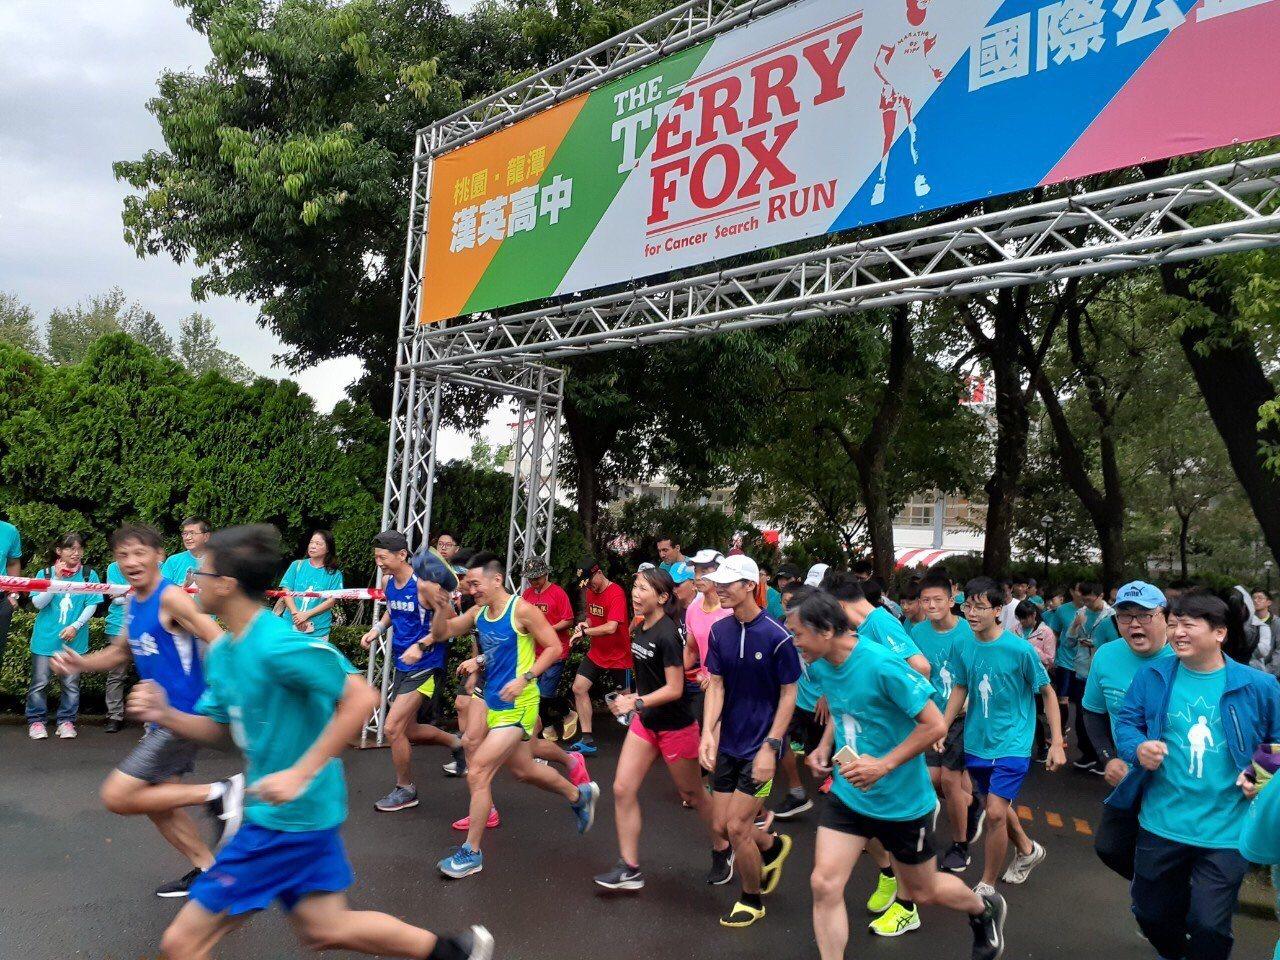 2019 Terry Fox Run國際公益路跑活動於今日上午8點在龍潭漢英高中...